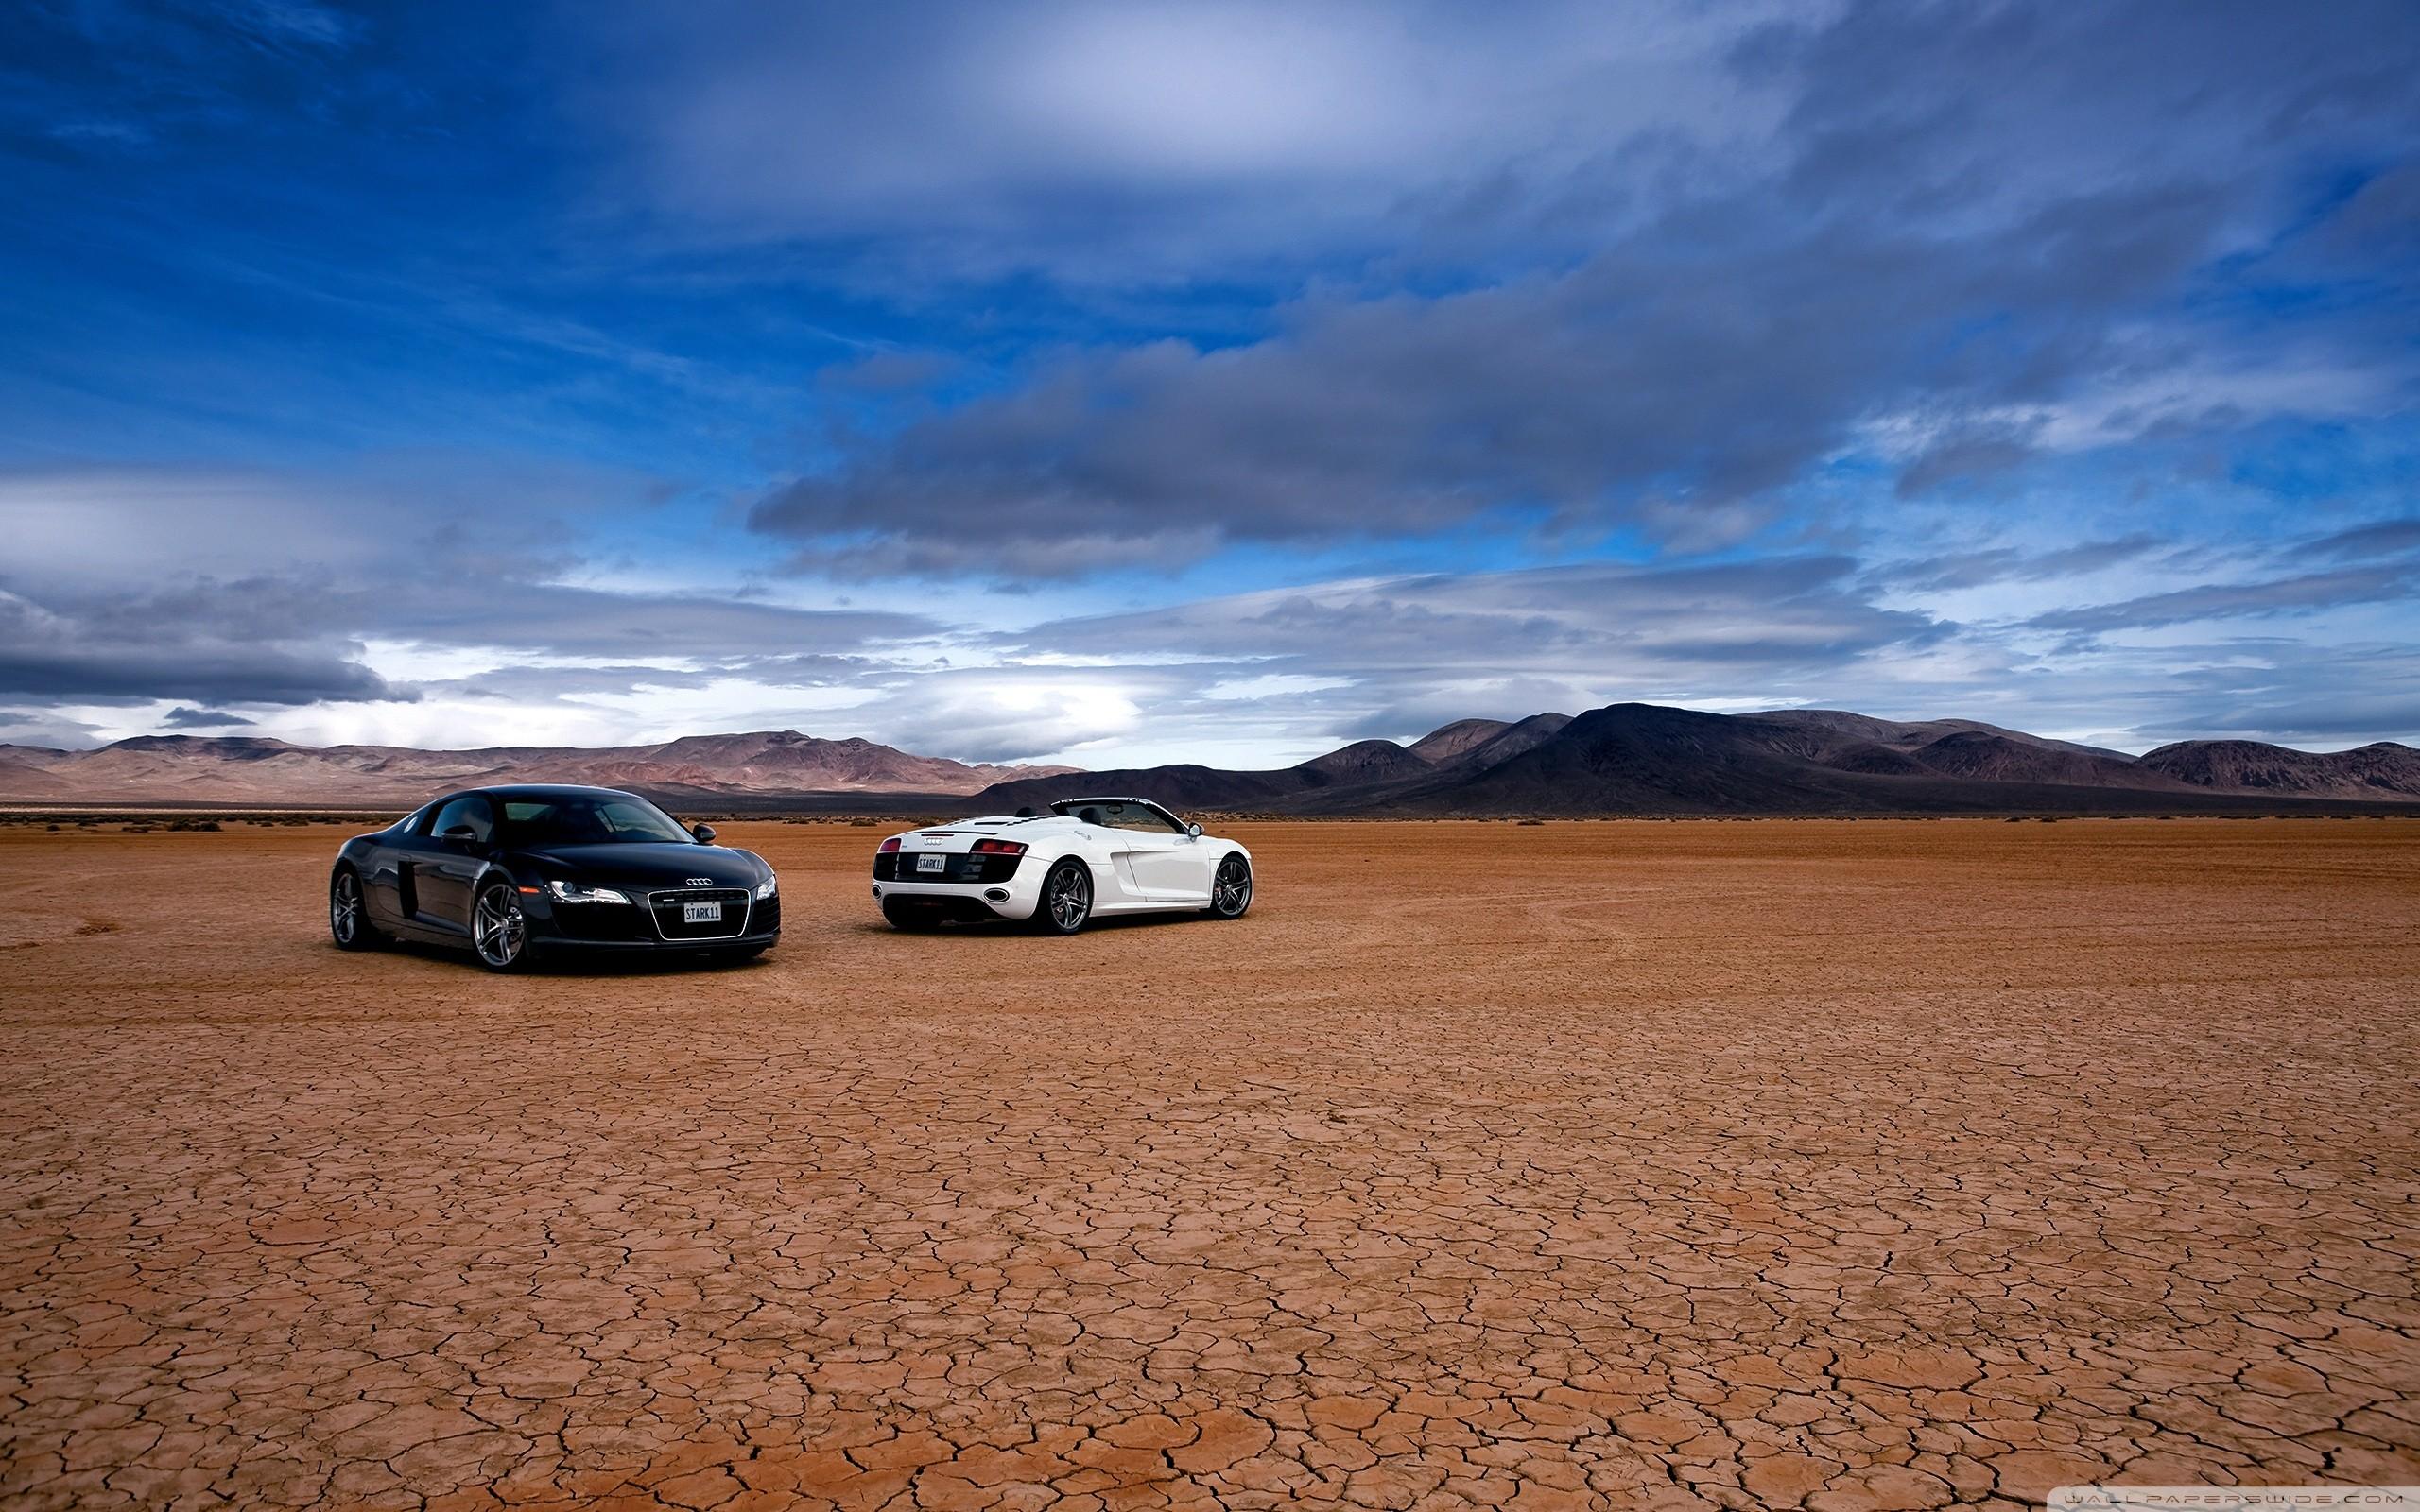 Audi R8 In The Desert HD Wide Wallpaper for Widescreen